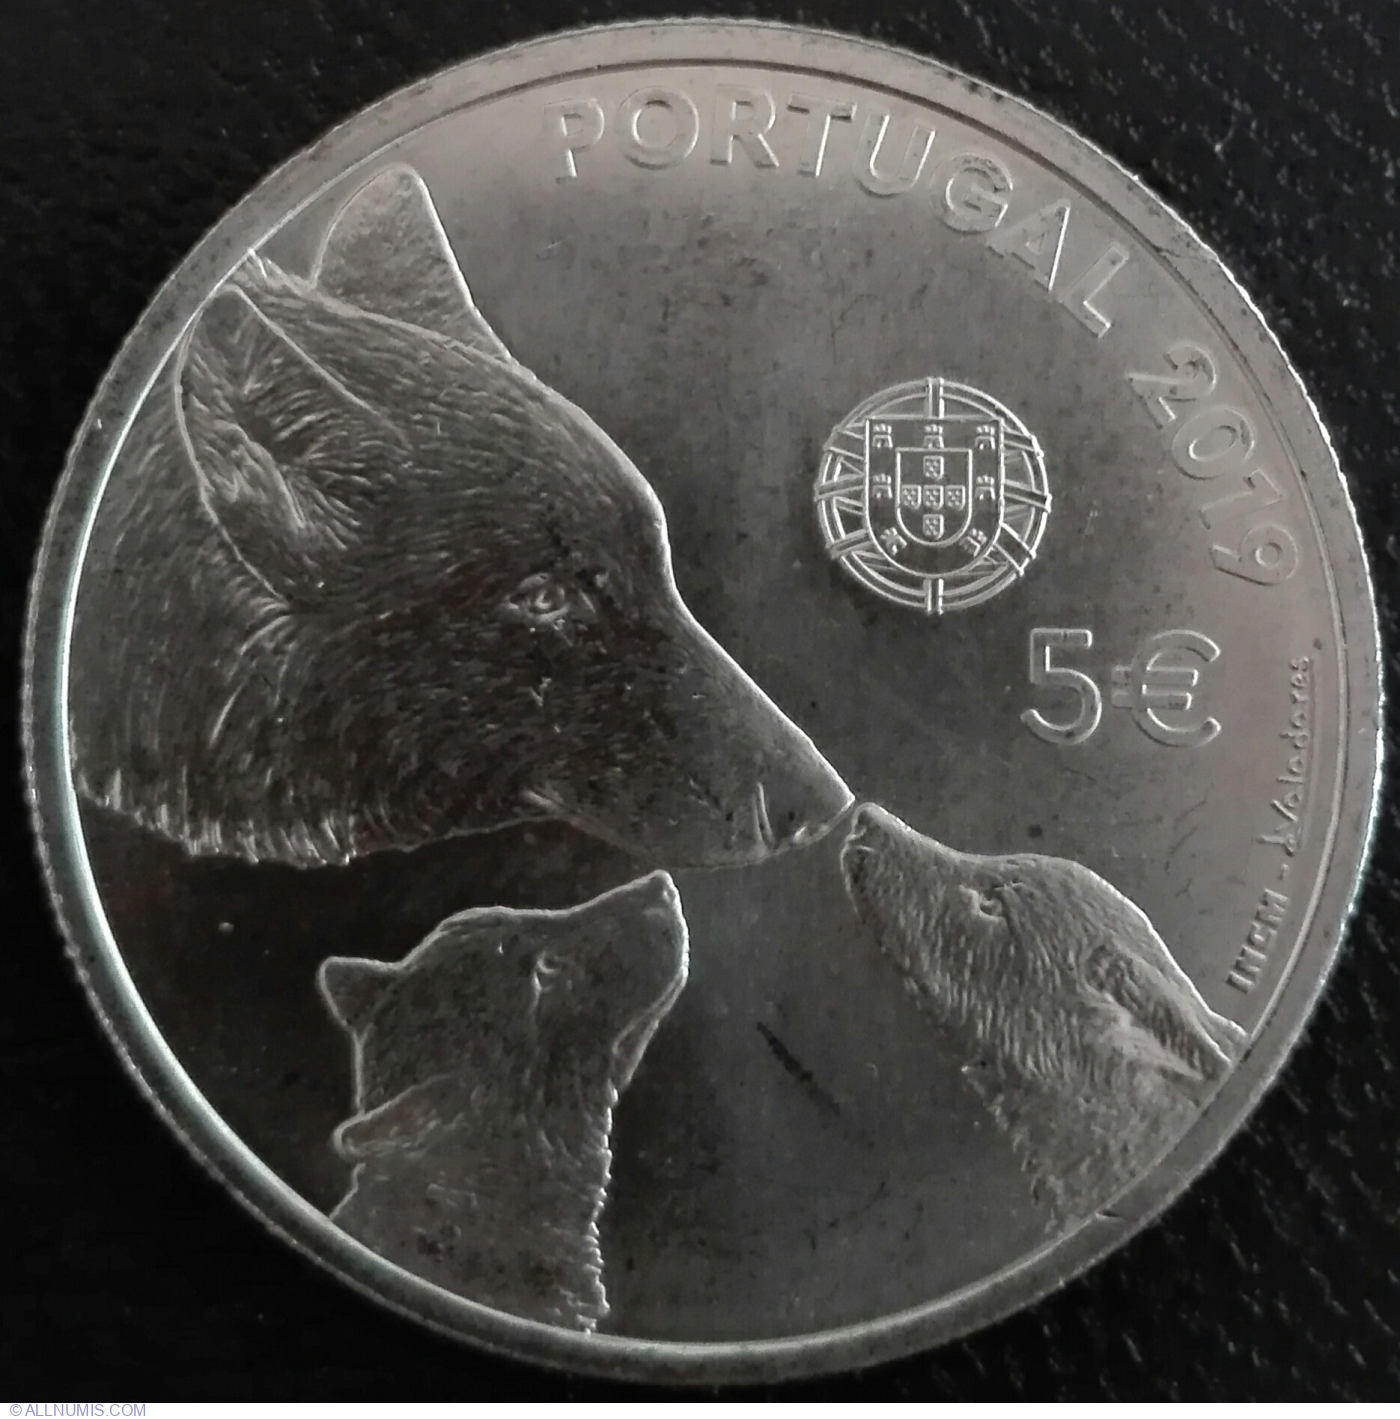 2019-5 EURO SILVER COIN PROOF PORTUGAL lobo ibérico